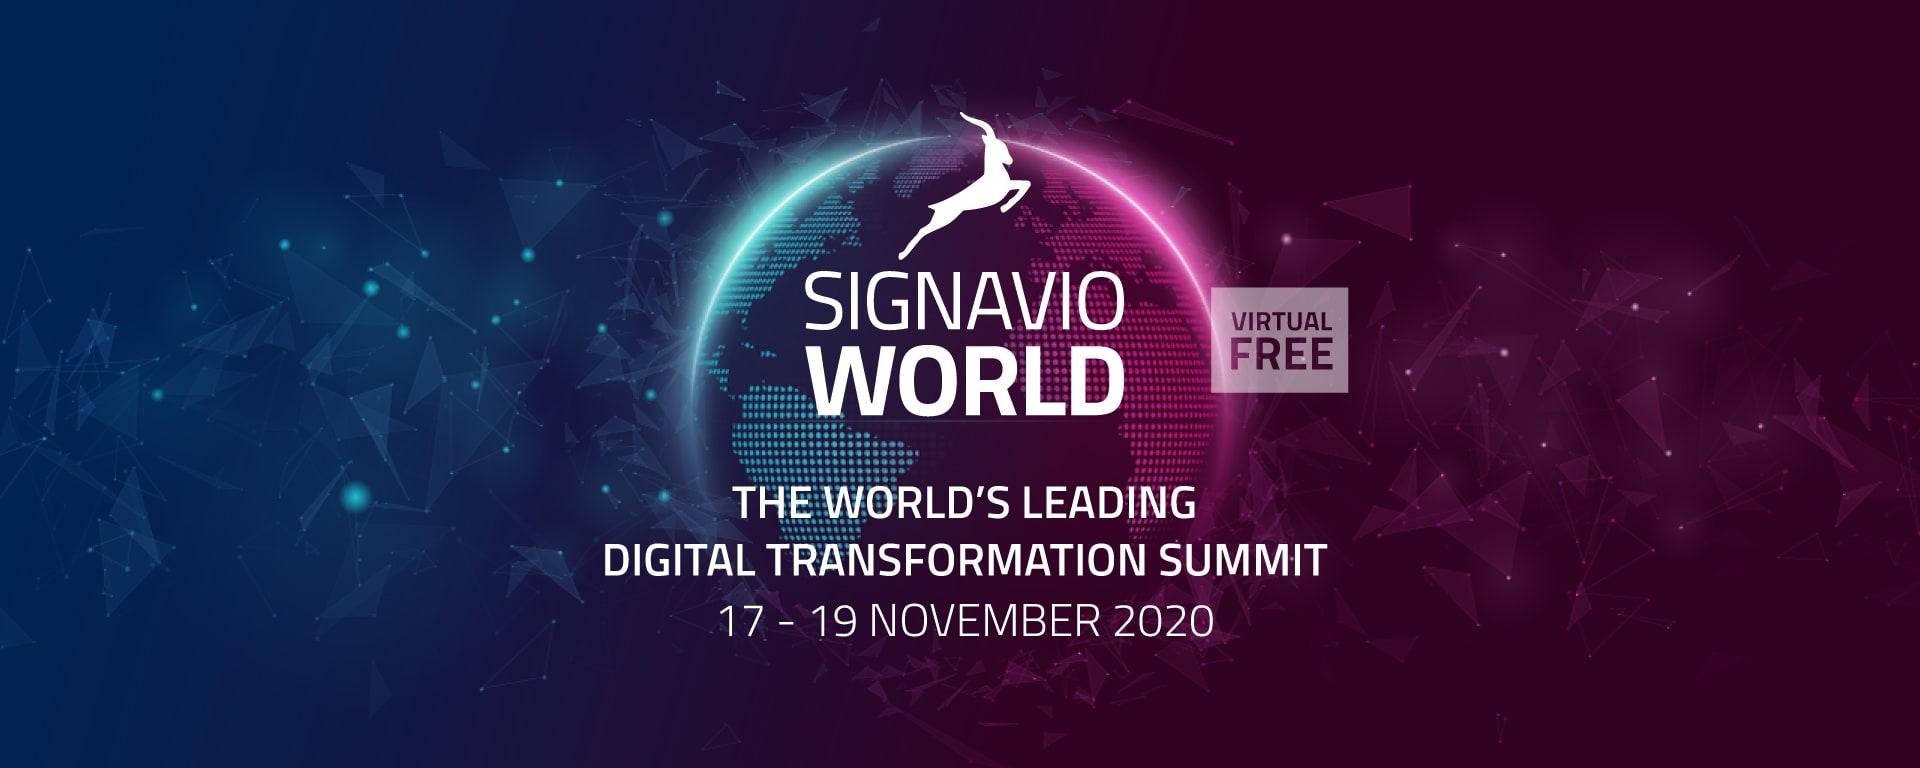 Signavio World 2020 Blog Titelbild